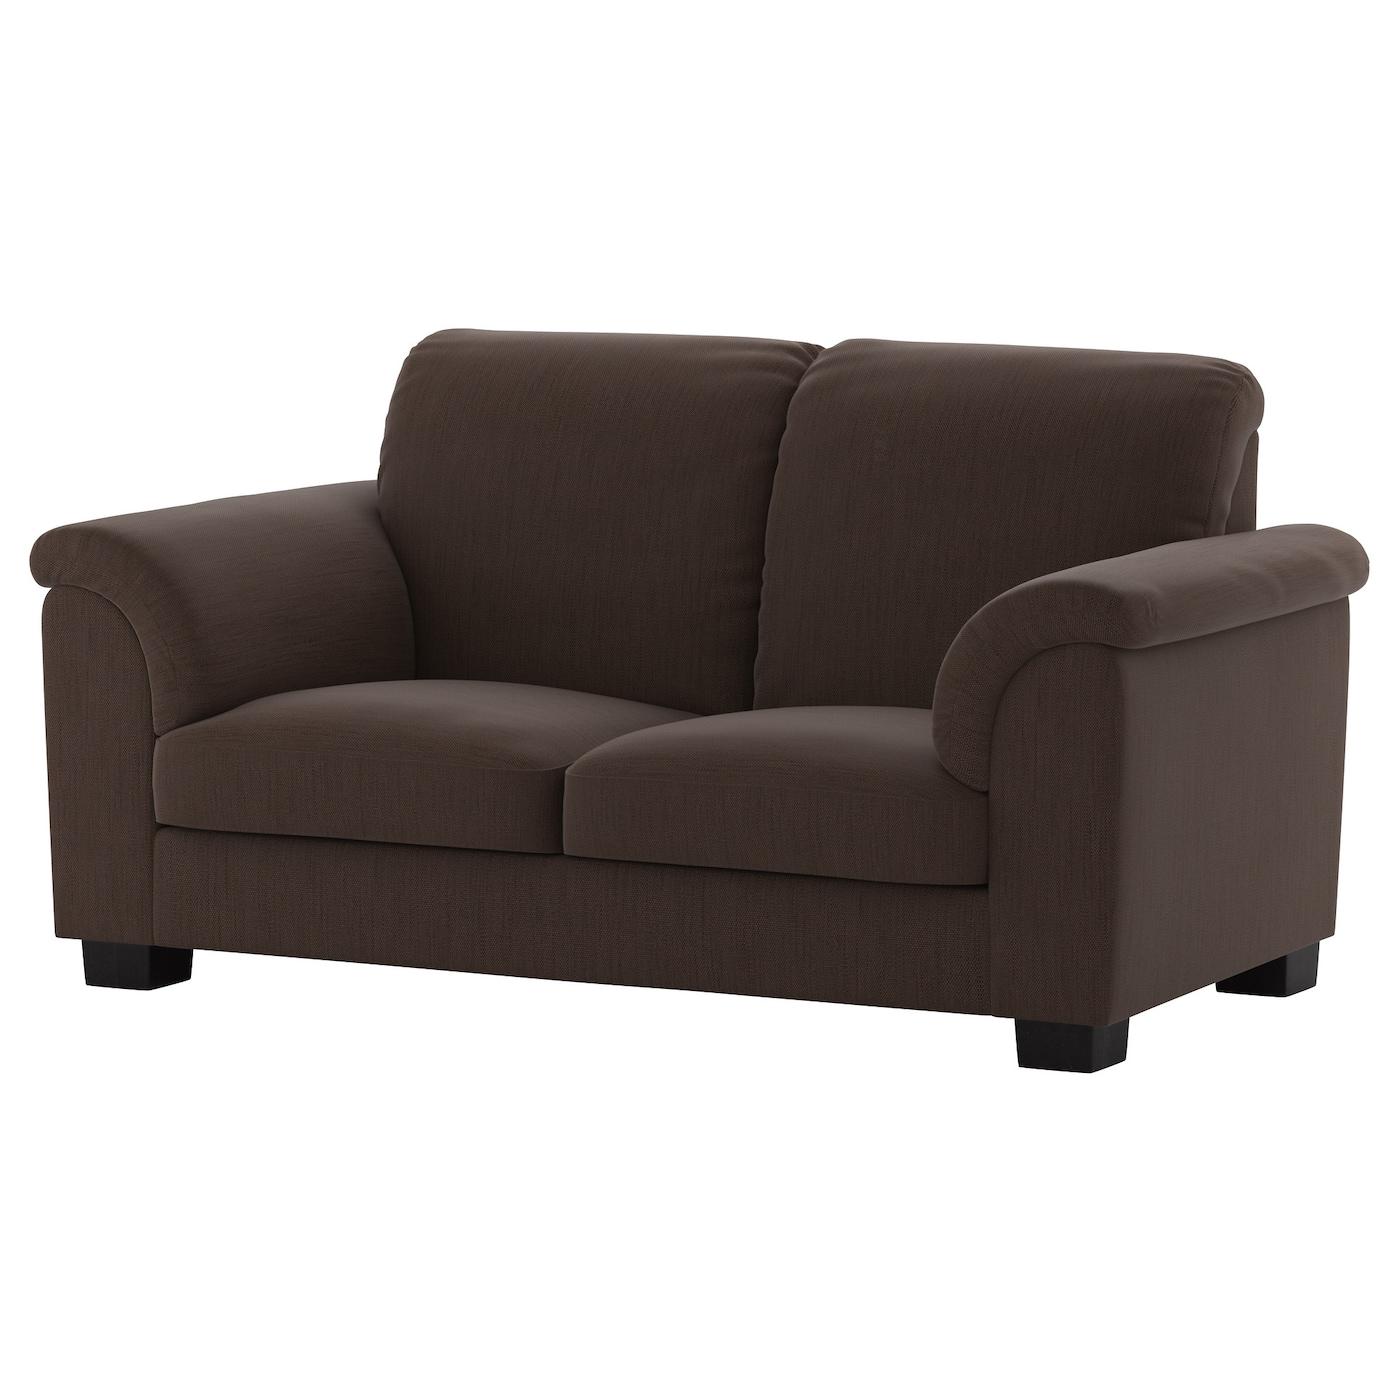 Tidafors two seat sofa hensta dark brown ikea for Divanetti ikea